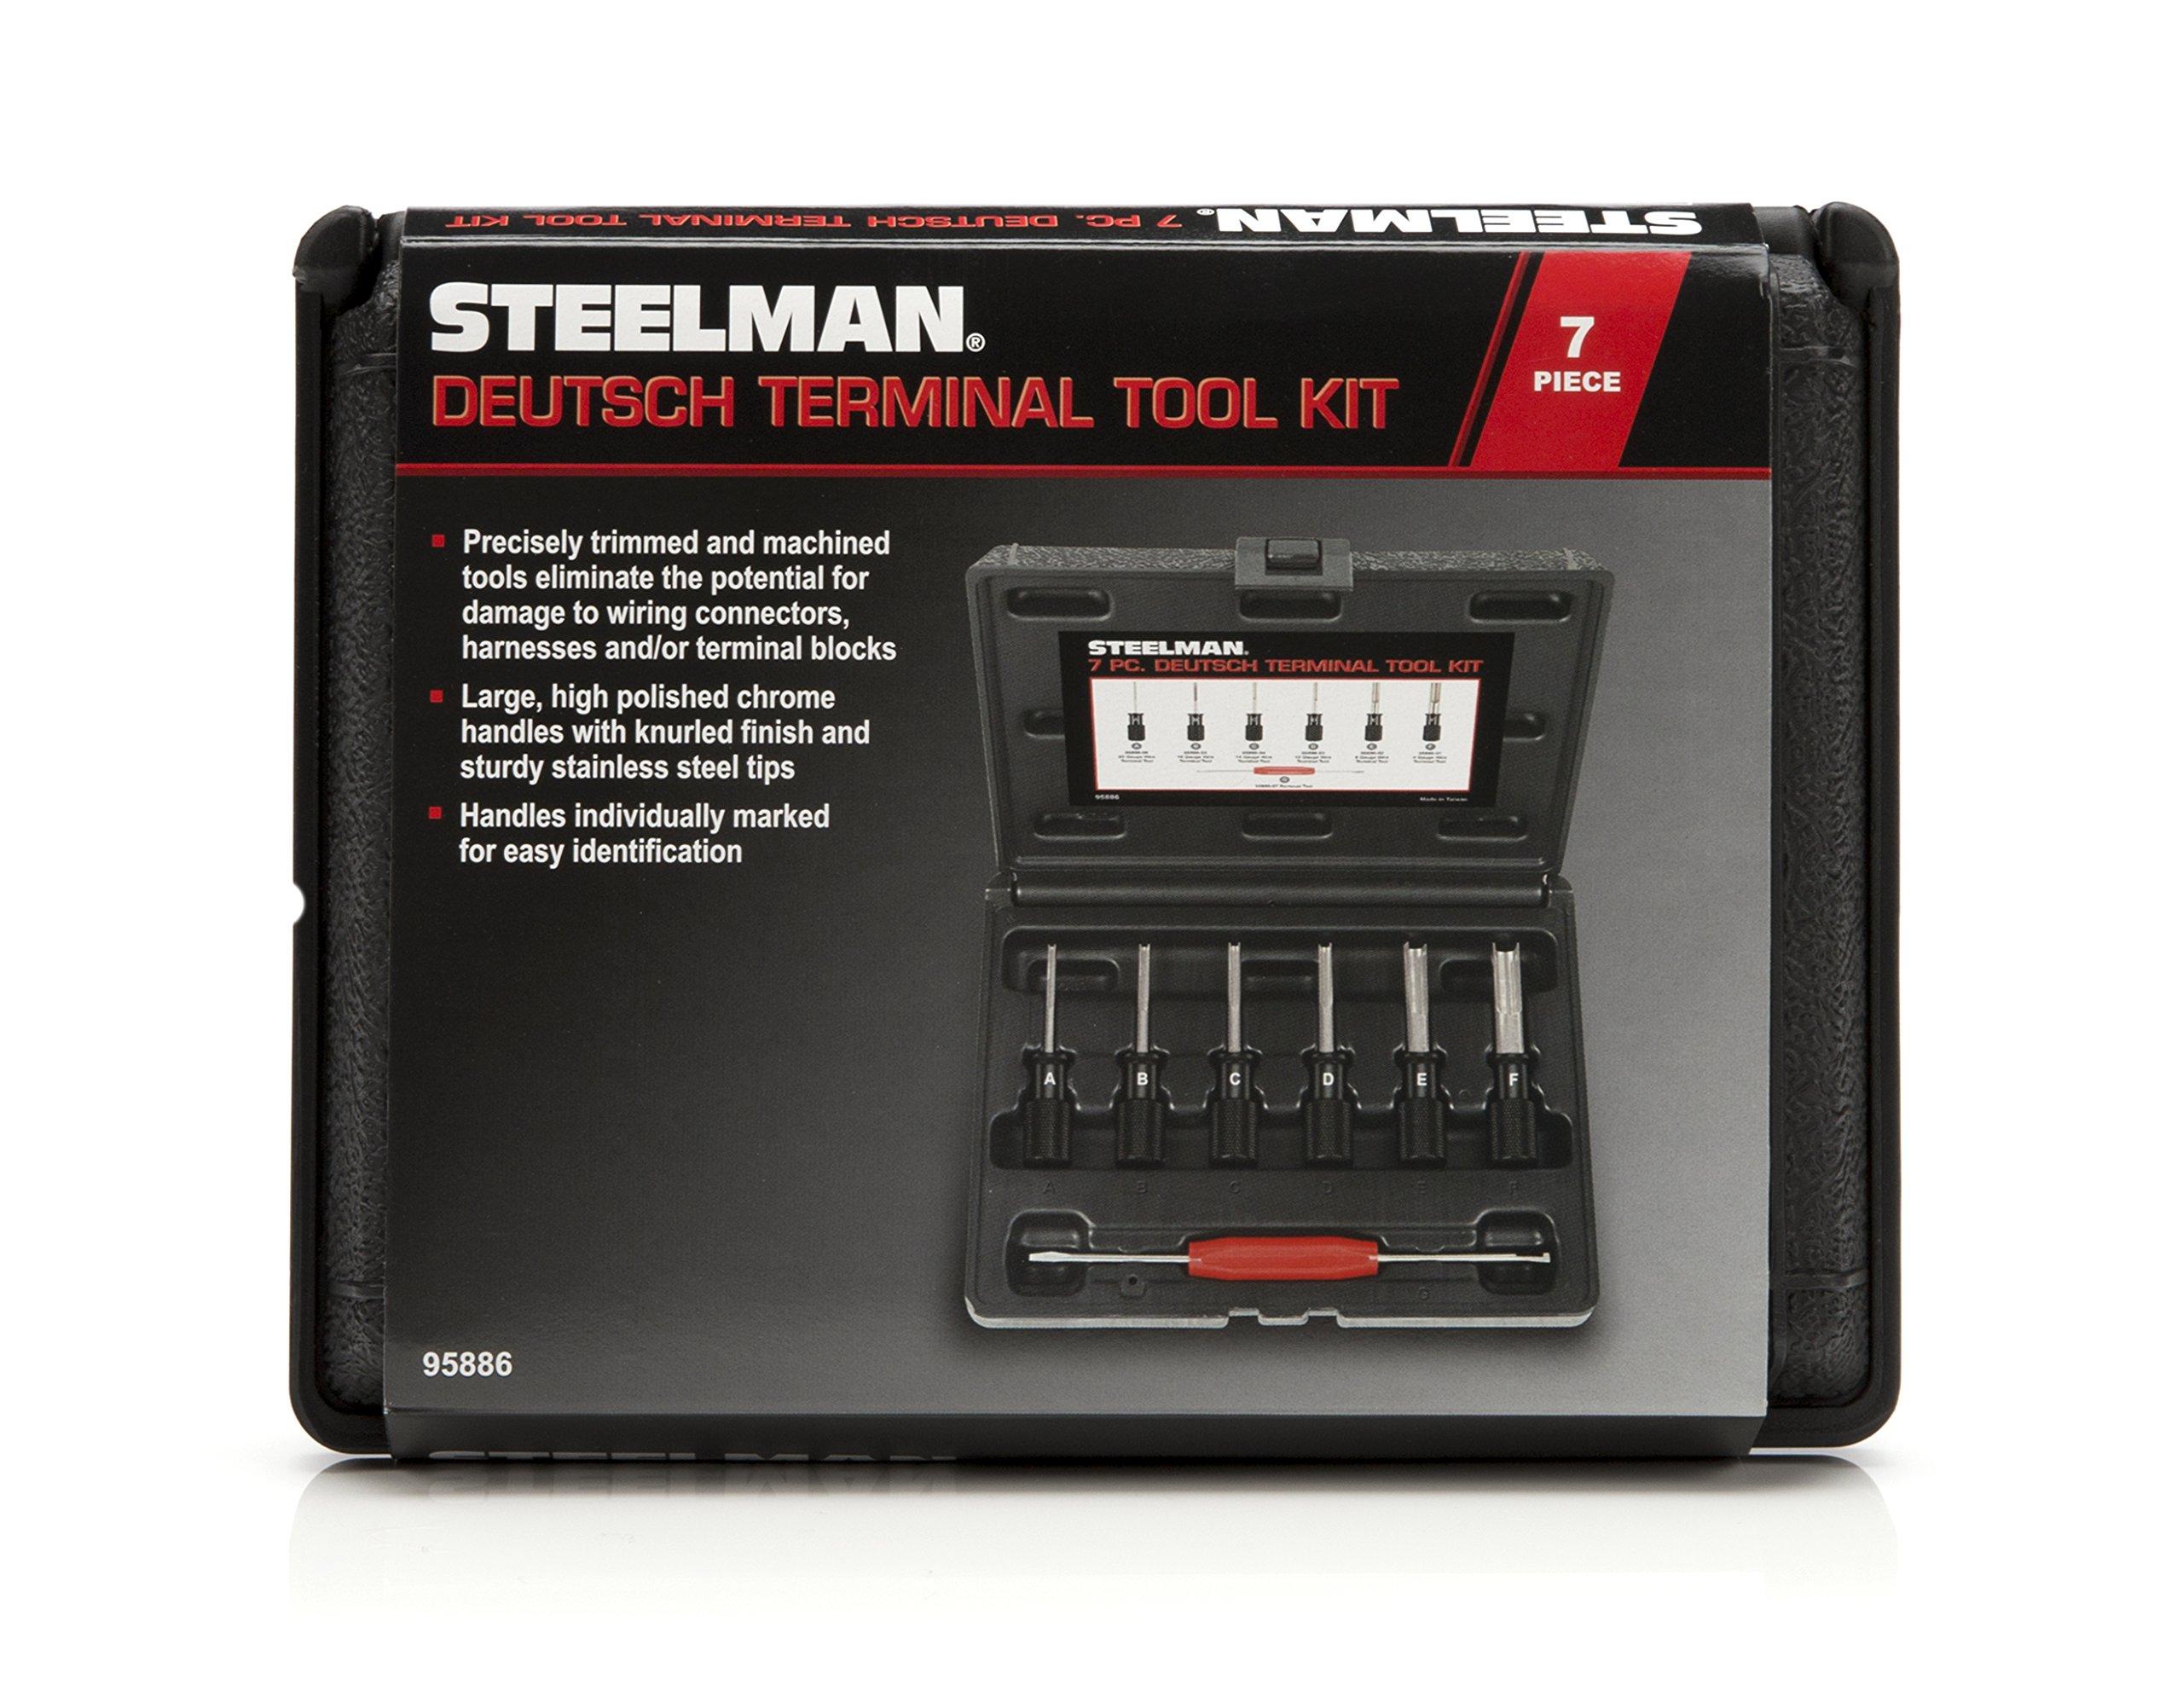 Steelman 95886 7-Piece Deutsch Terminal Tool Kit by Steelman (Image #9)